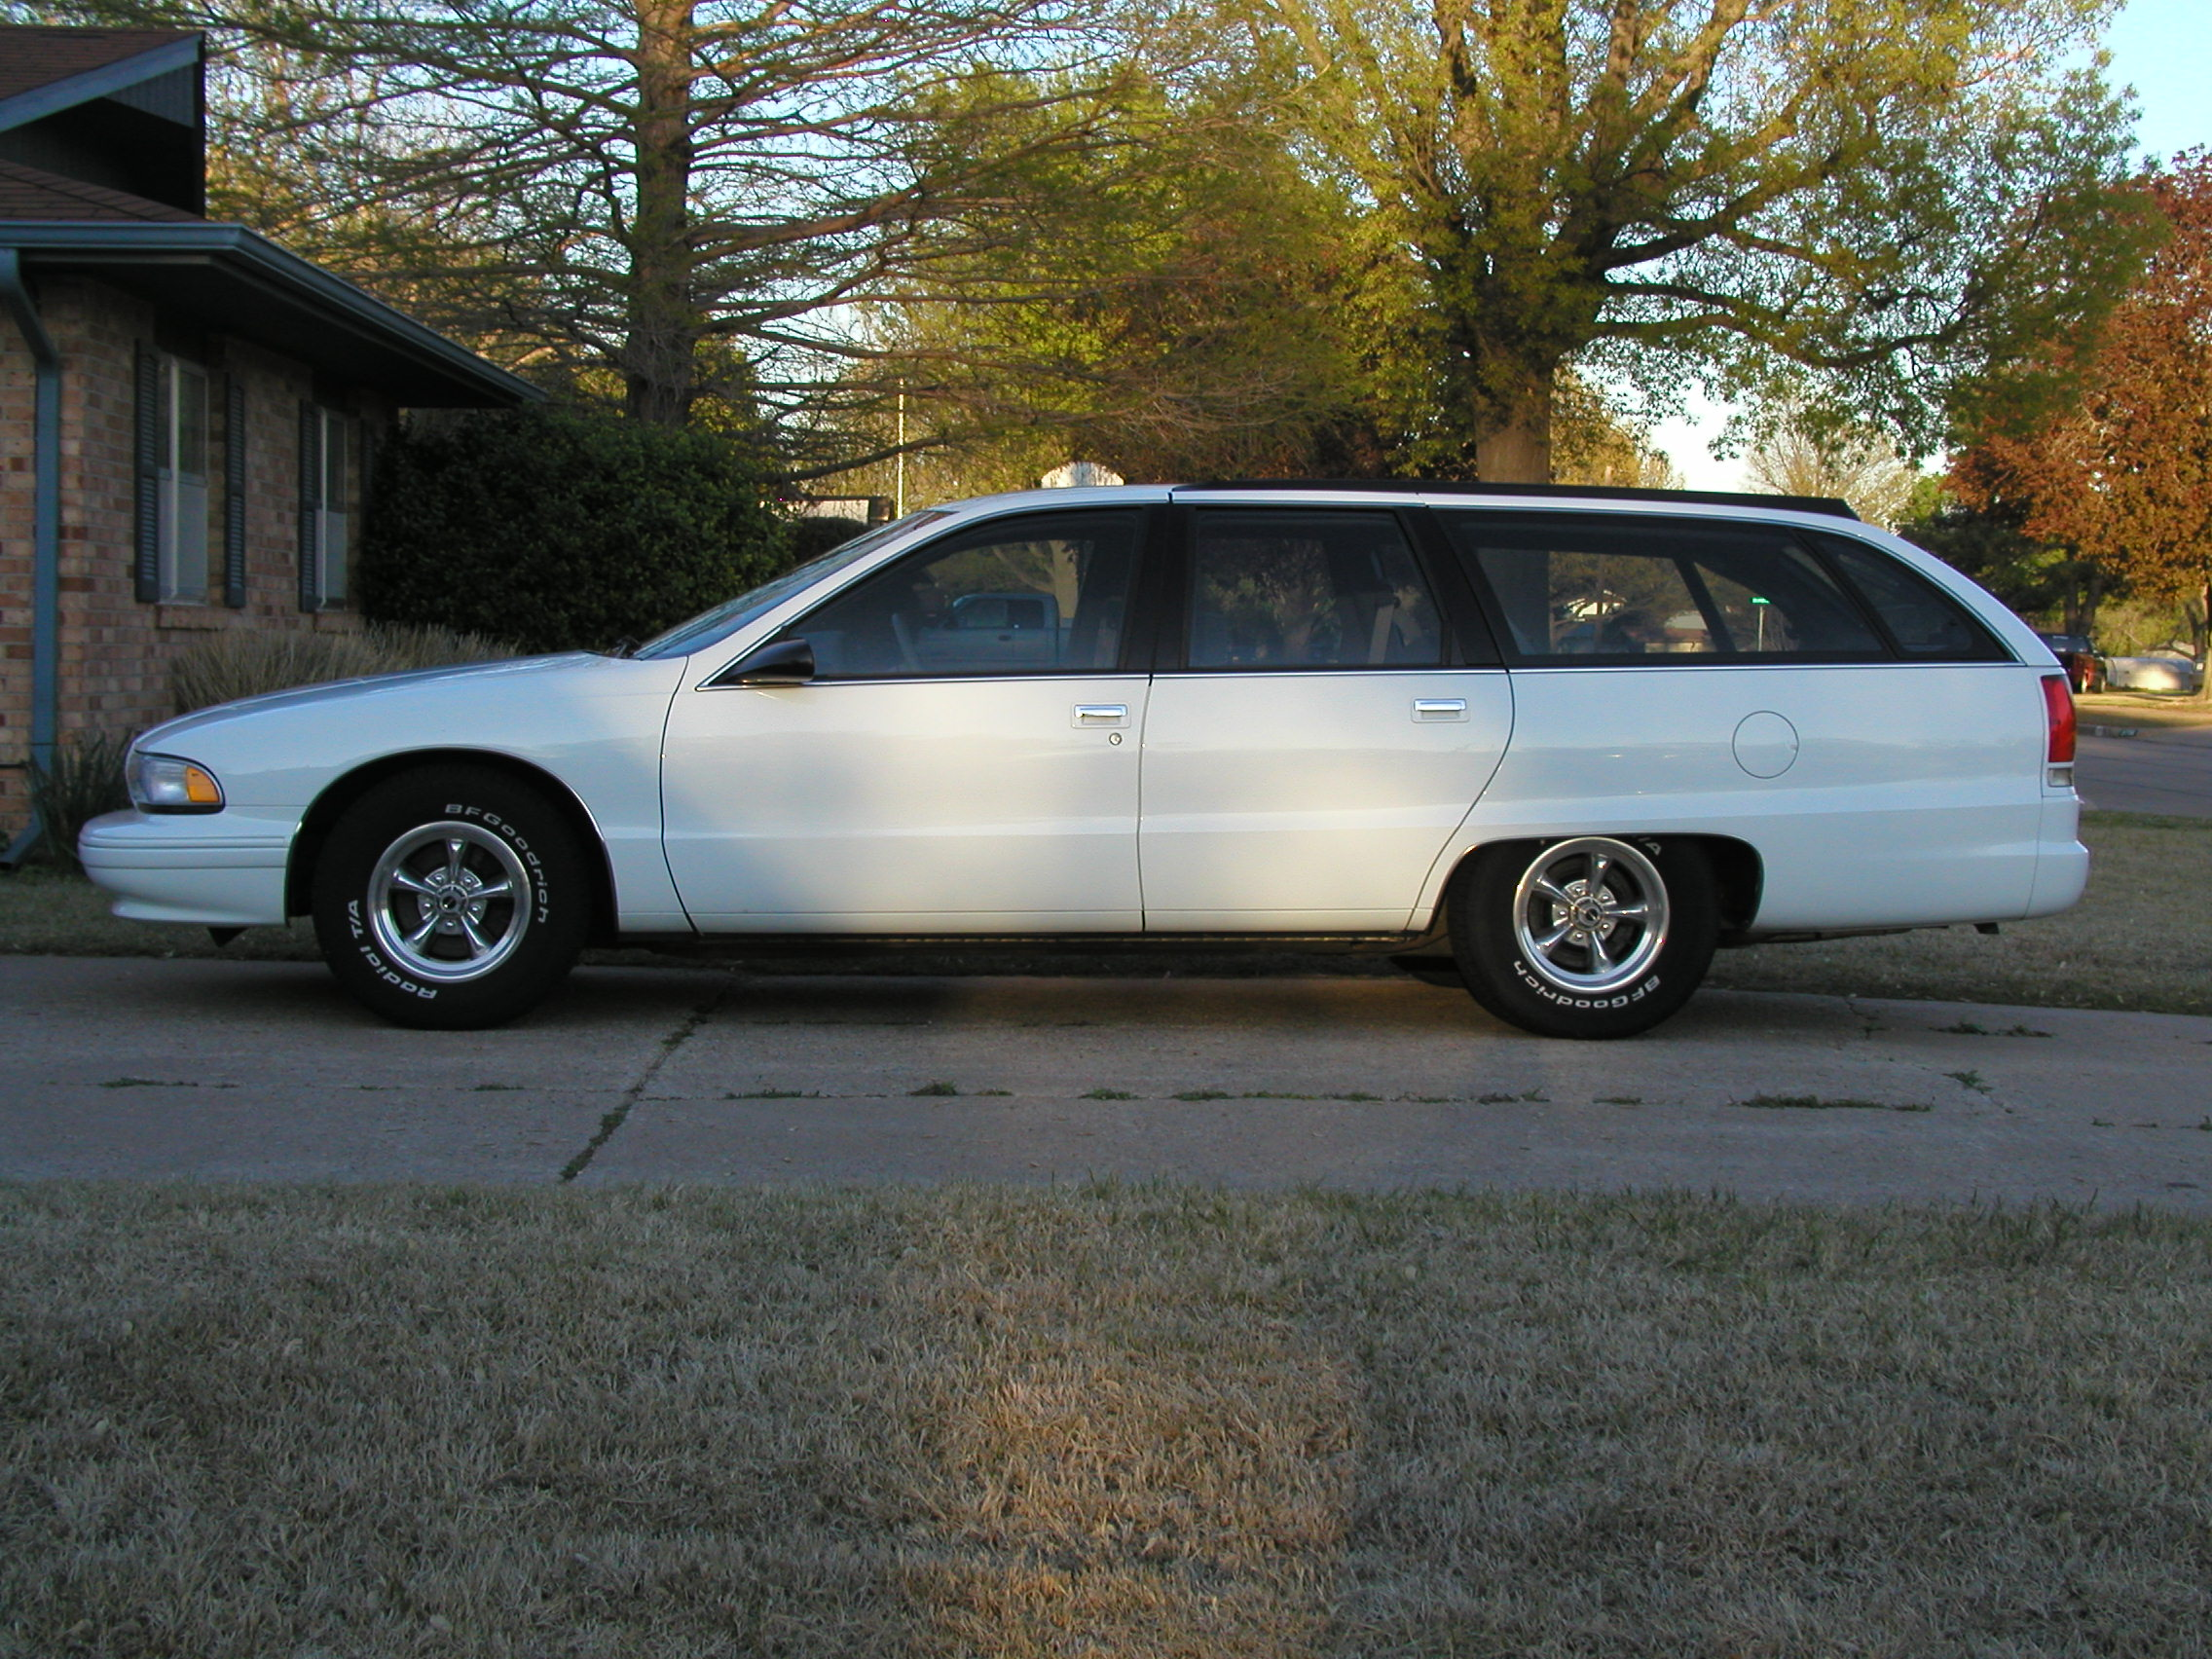 13577-1994-Chevrolet-Caprice.jpg